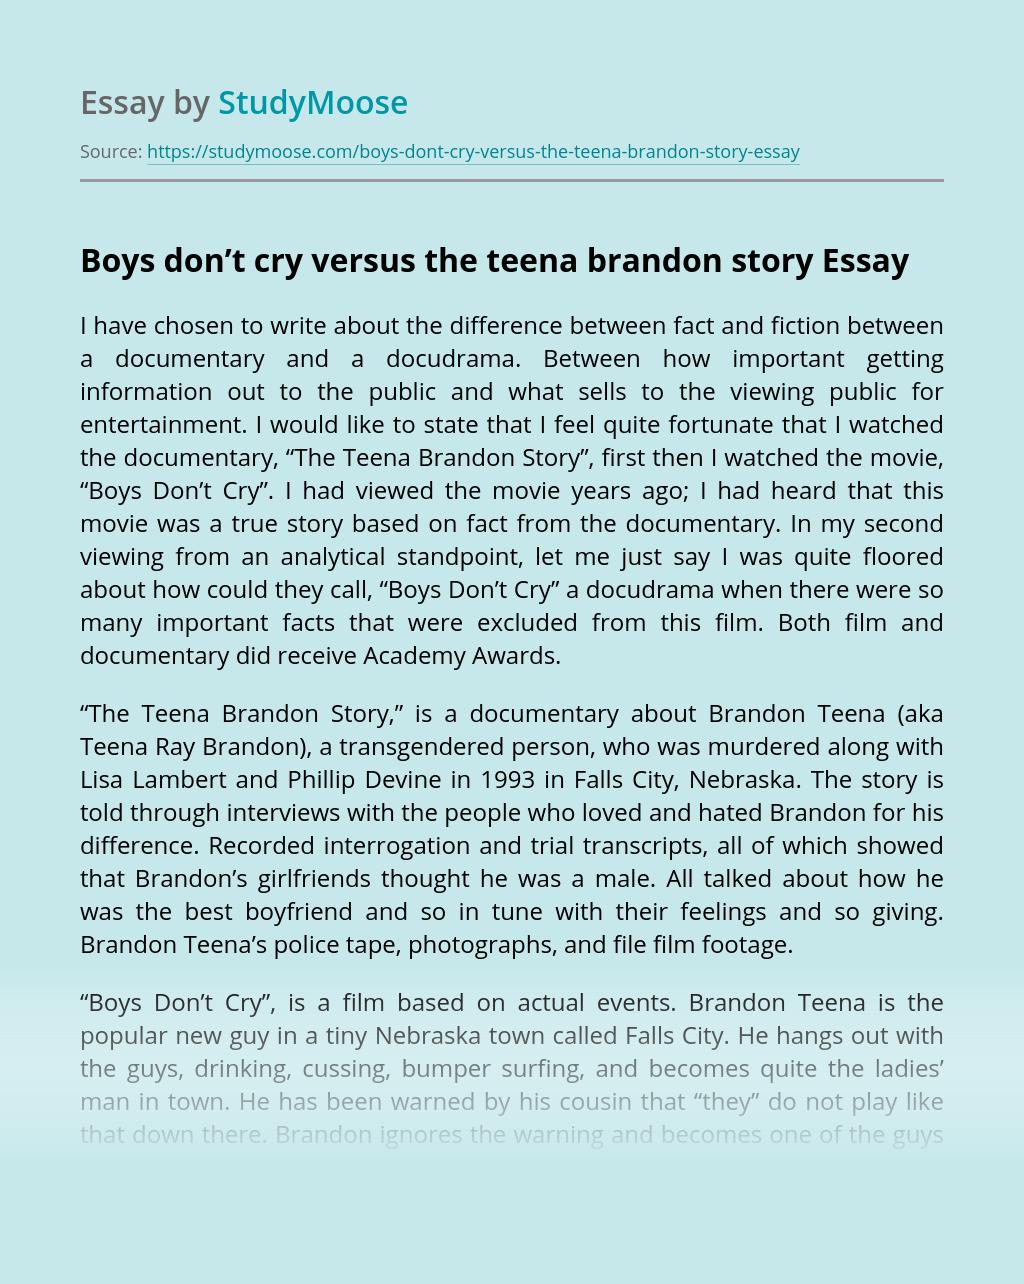 Boys Don't Cry versus the Teena Brandon Story